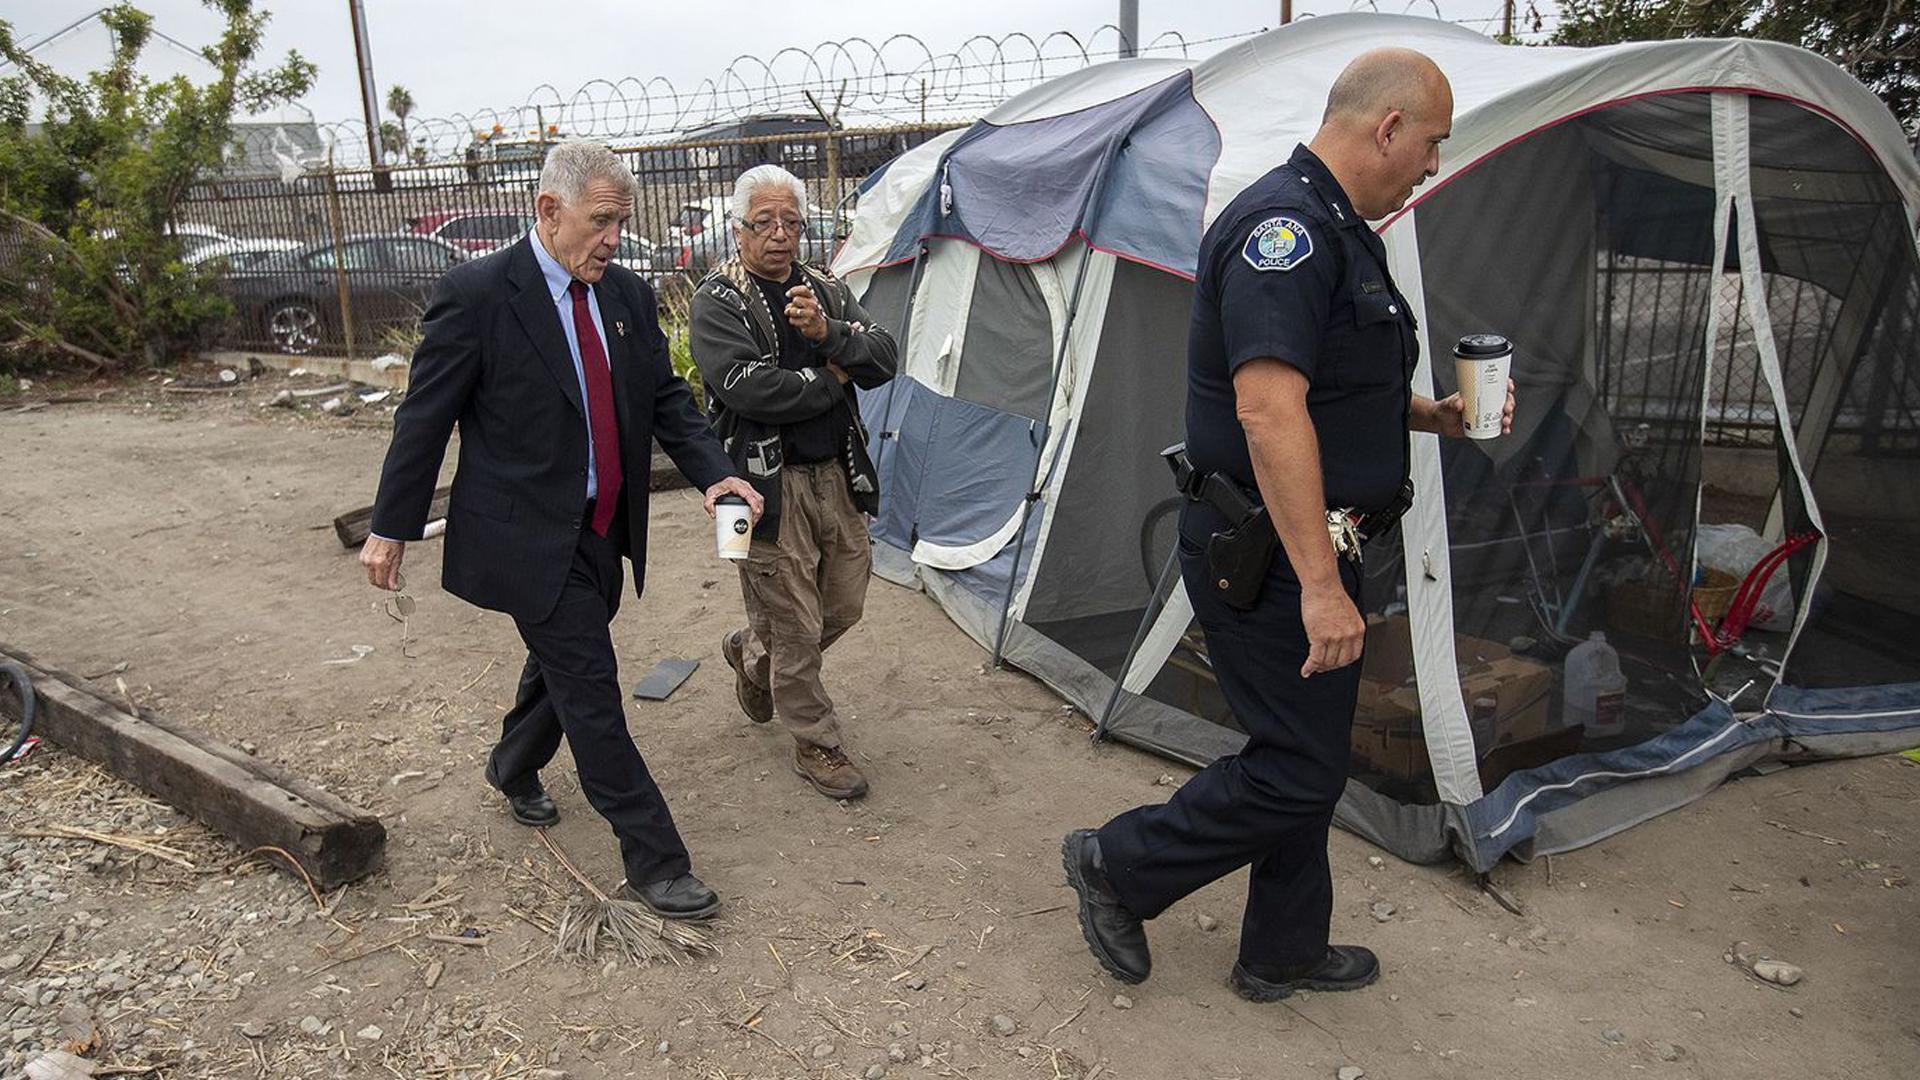 U.S. District Judge David Carter, left, homeless activist Lou Noble and Deputy Chief Ken Gominsky of the Santa Ana Police Department walk past a tent along railroad tracks near Main Street in Santa Ana on June 5, 2018. (Credit: Scott Smeltzer / Daily Pilot)